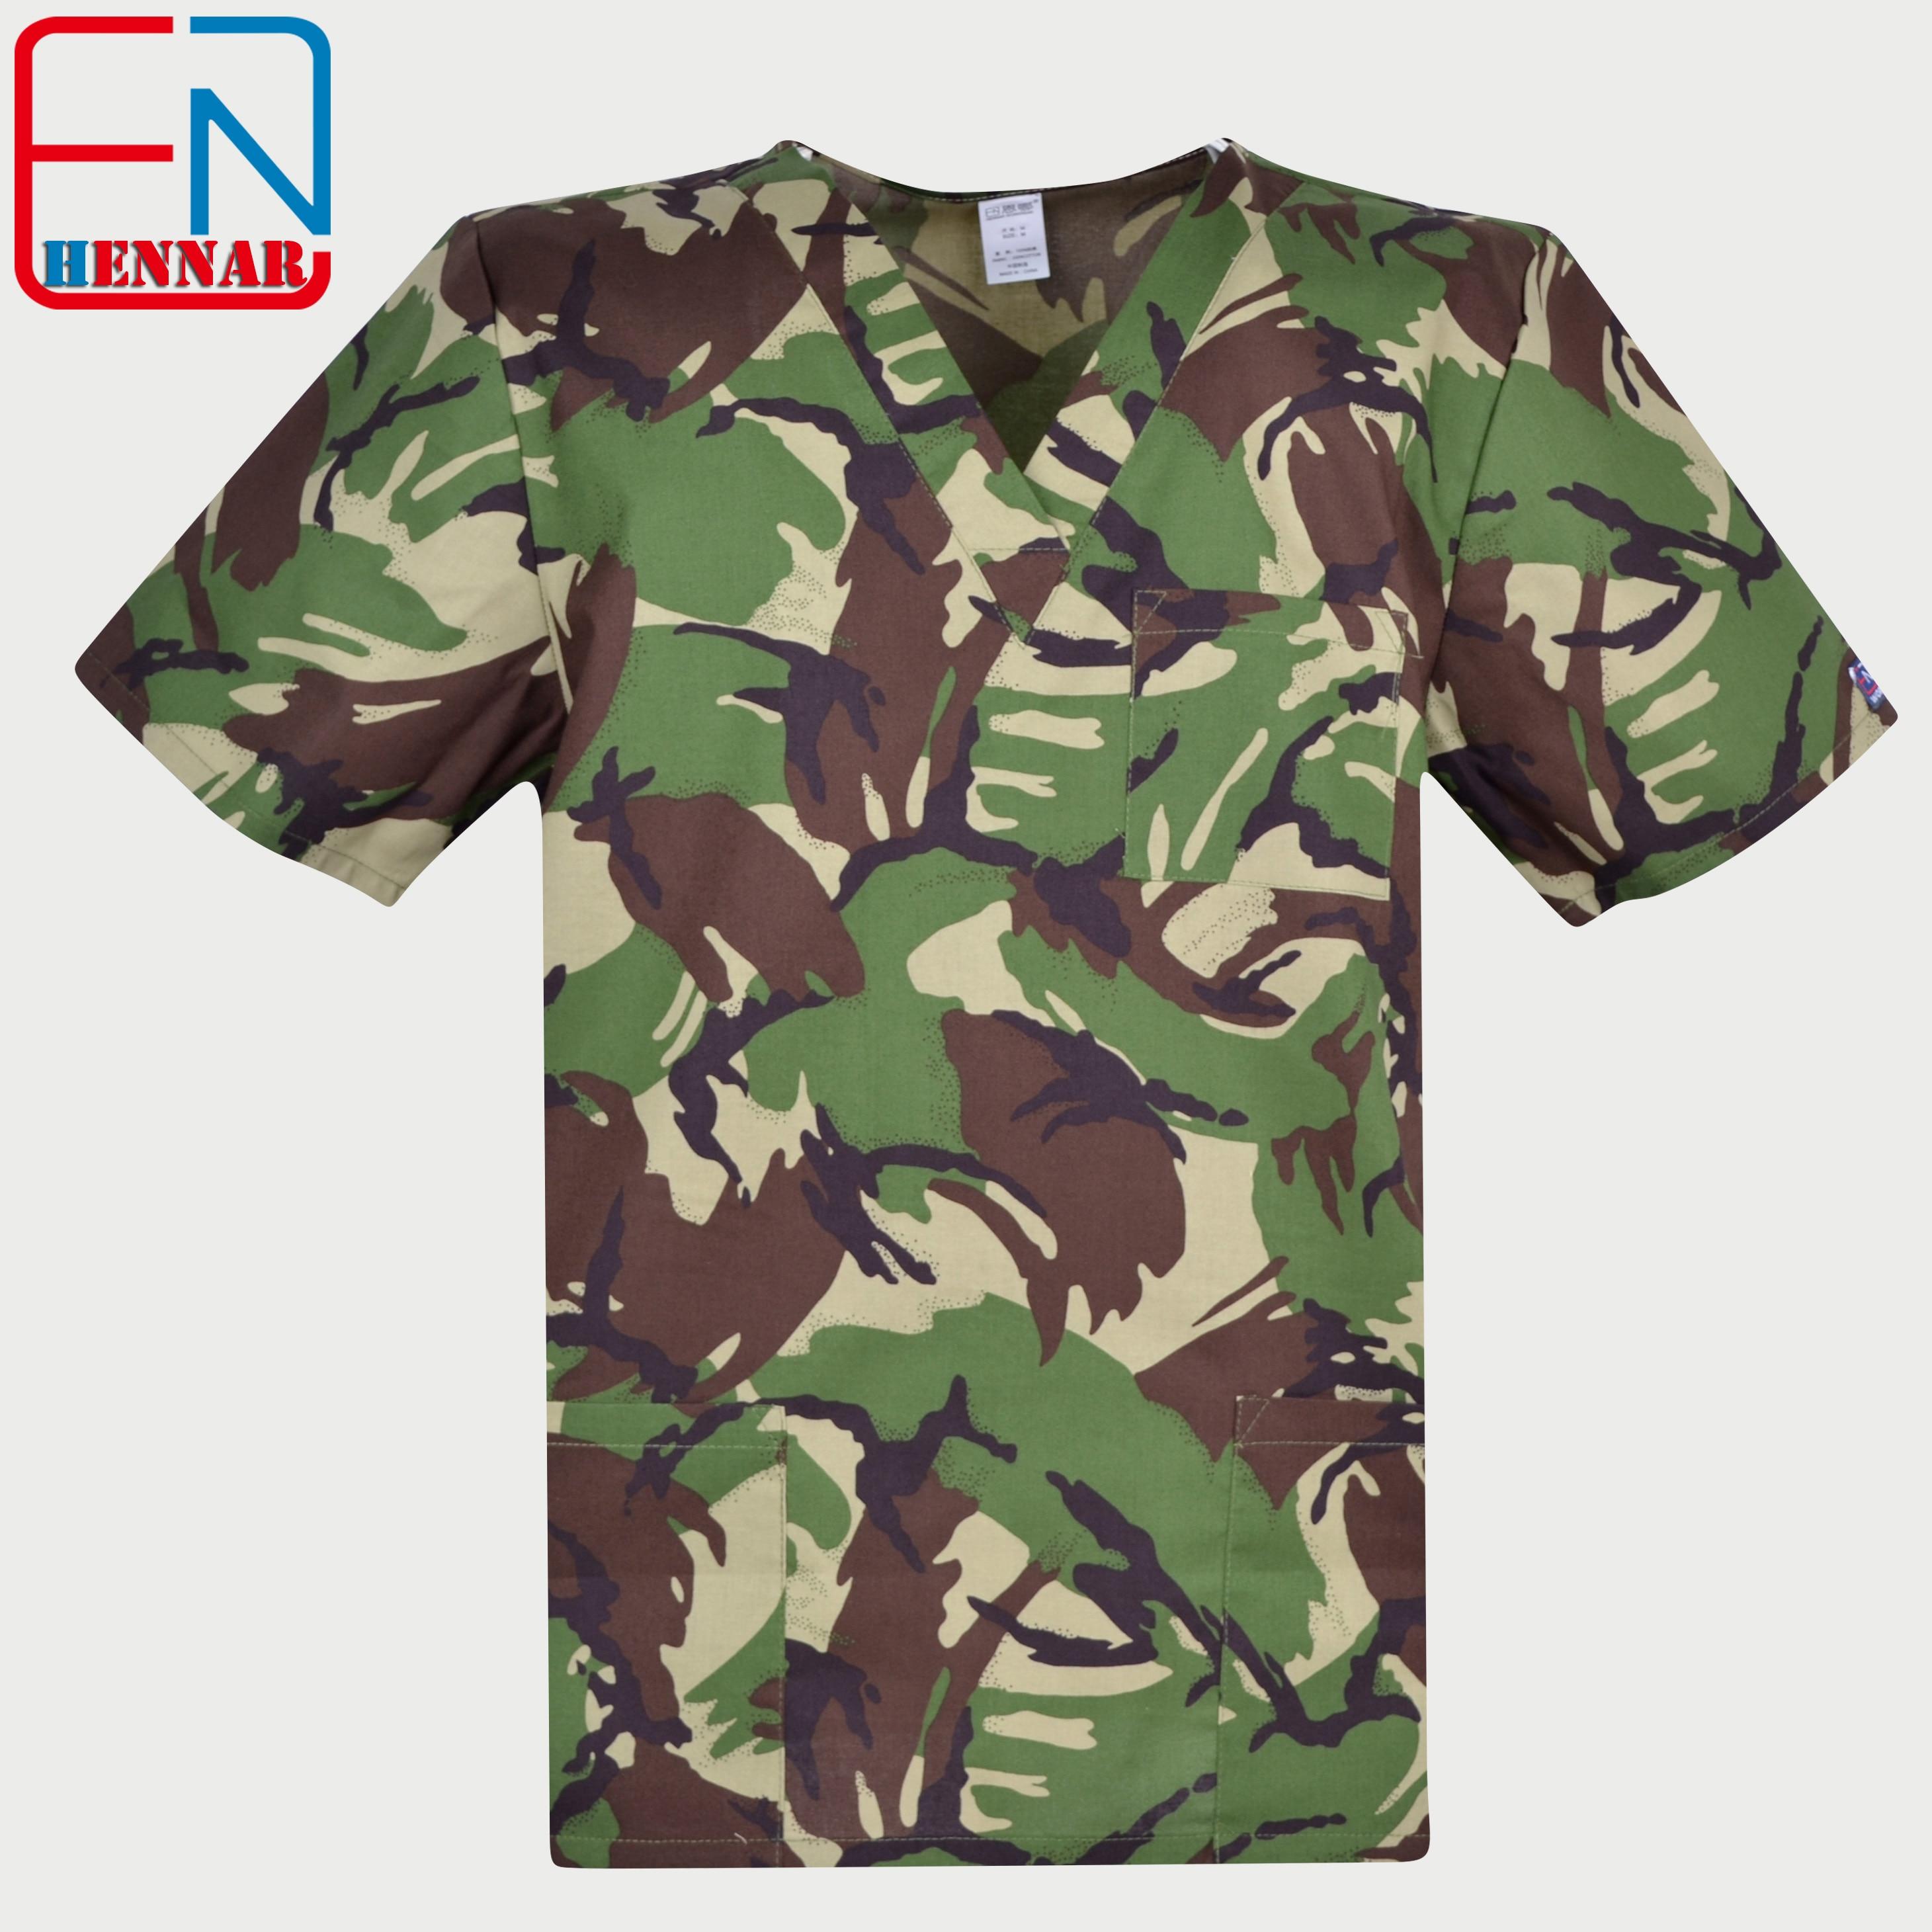 Hennar Brand Men Medical Scrub Top 100% Cotton Medical Uniforms